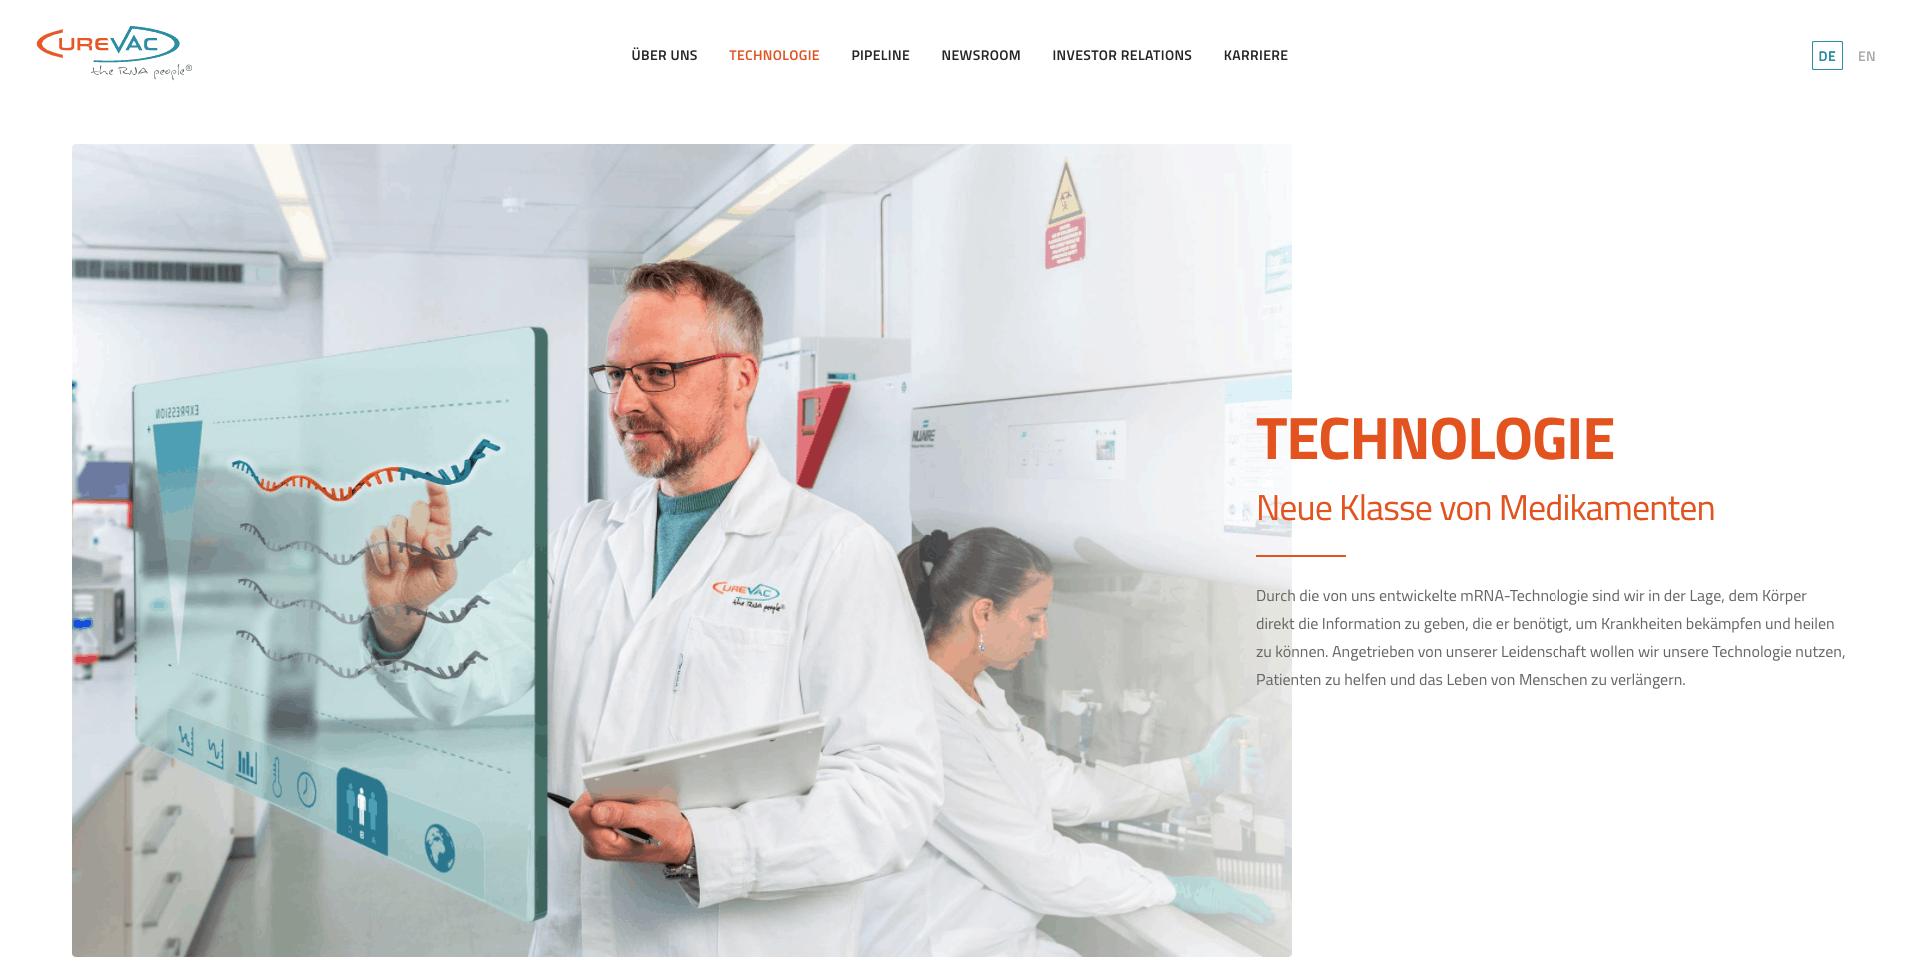 Curevac technologie